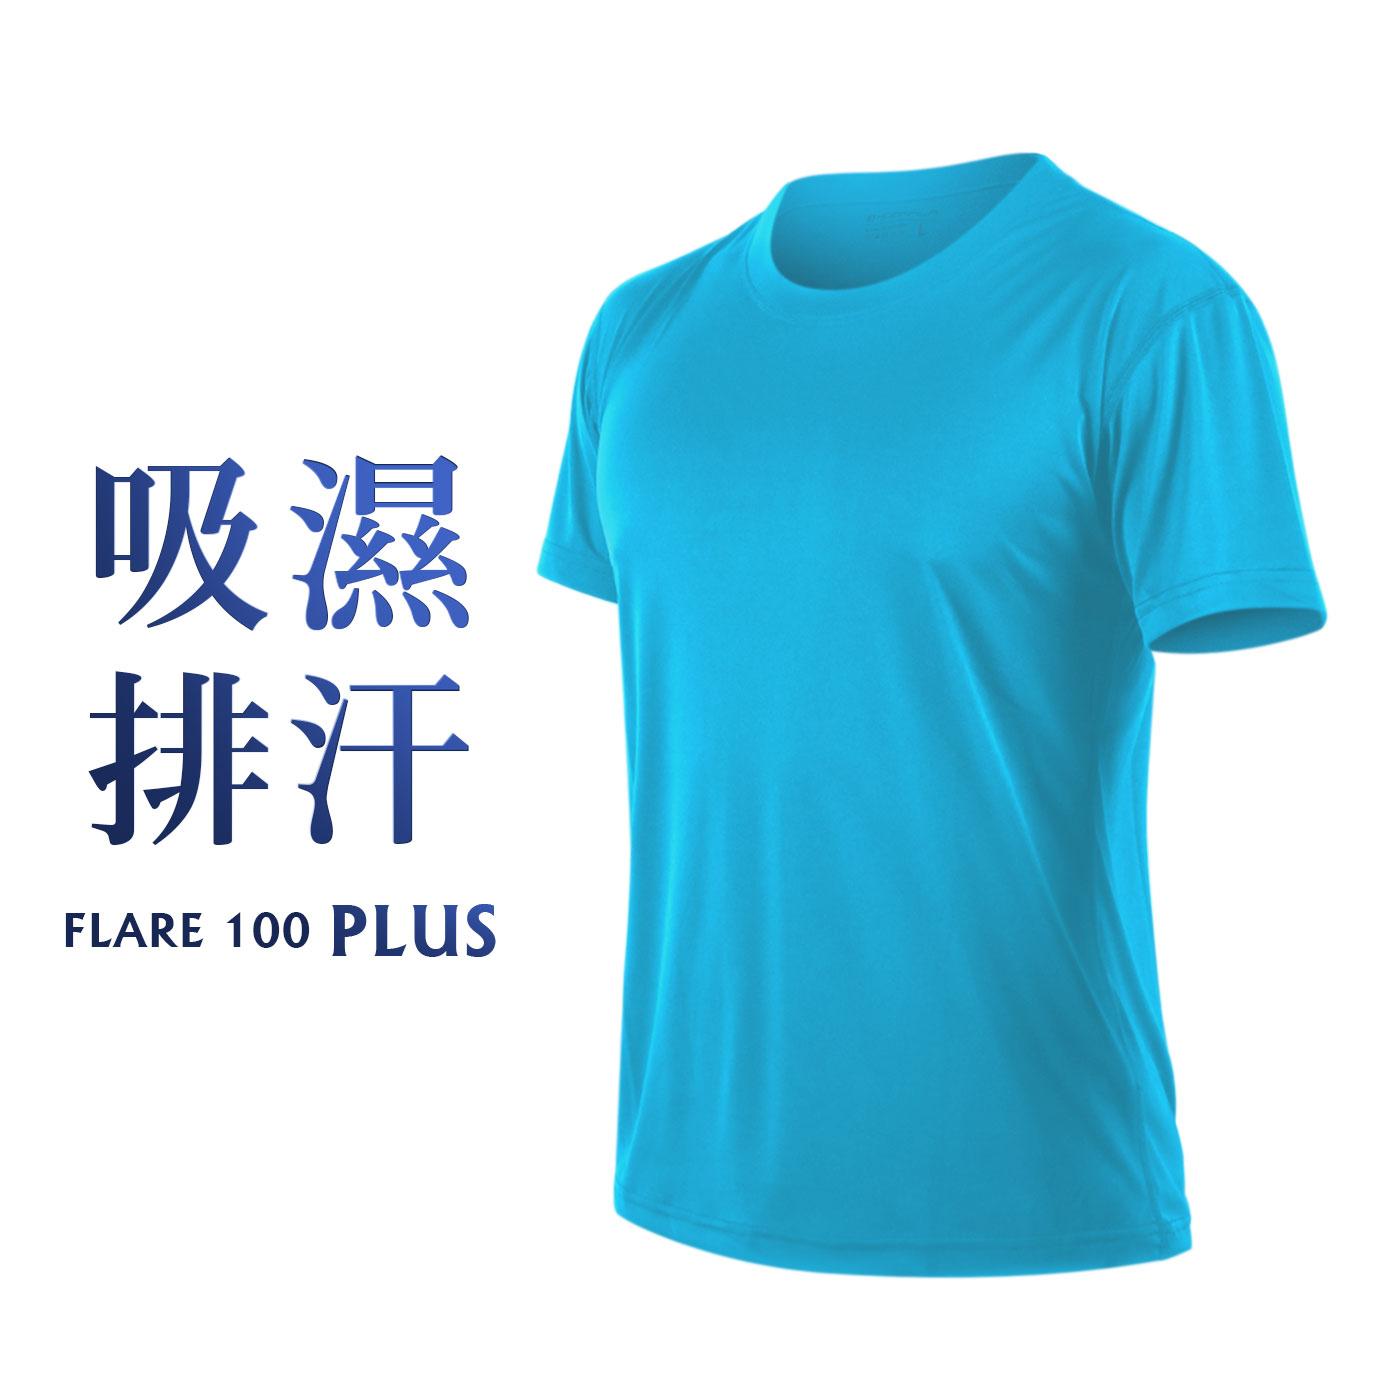 HODARLA FLARE 100 PLUS 吸濕排汗衫 3153701 - 亮藍